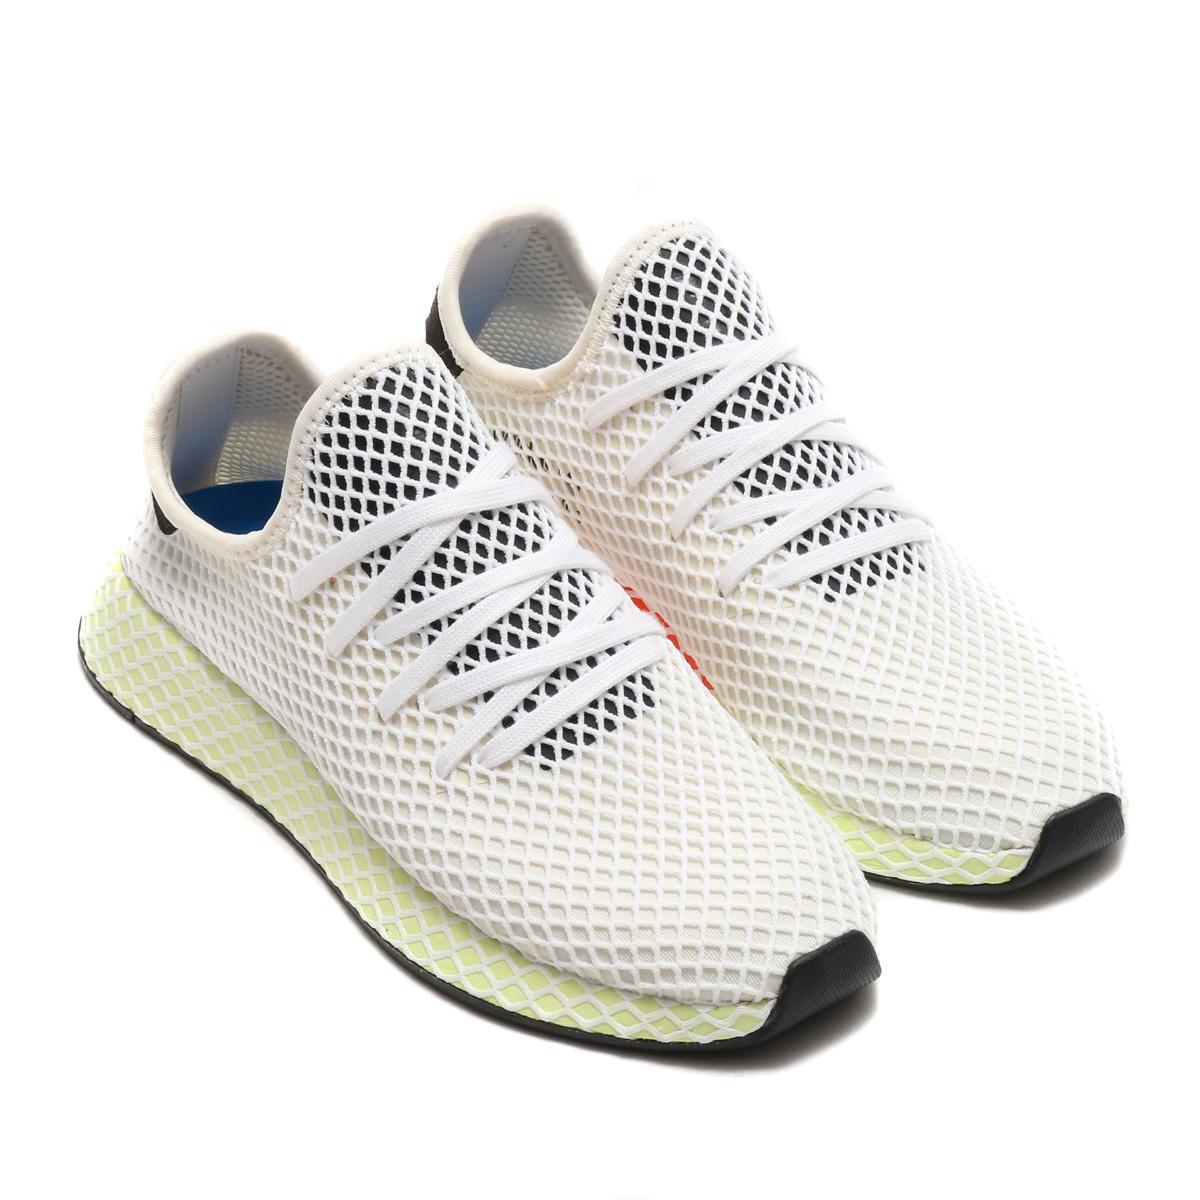 adidas Originals DEERUPT RUNNER(アディダス オリジナルス ディーラプト ランナー)(チョークホワイト/コアブラック/コアブラック)18SS-I